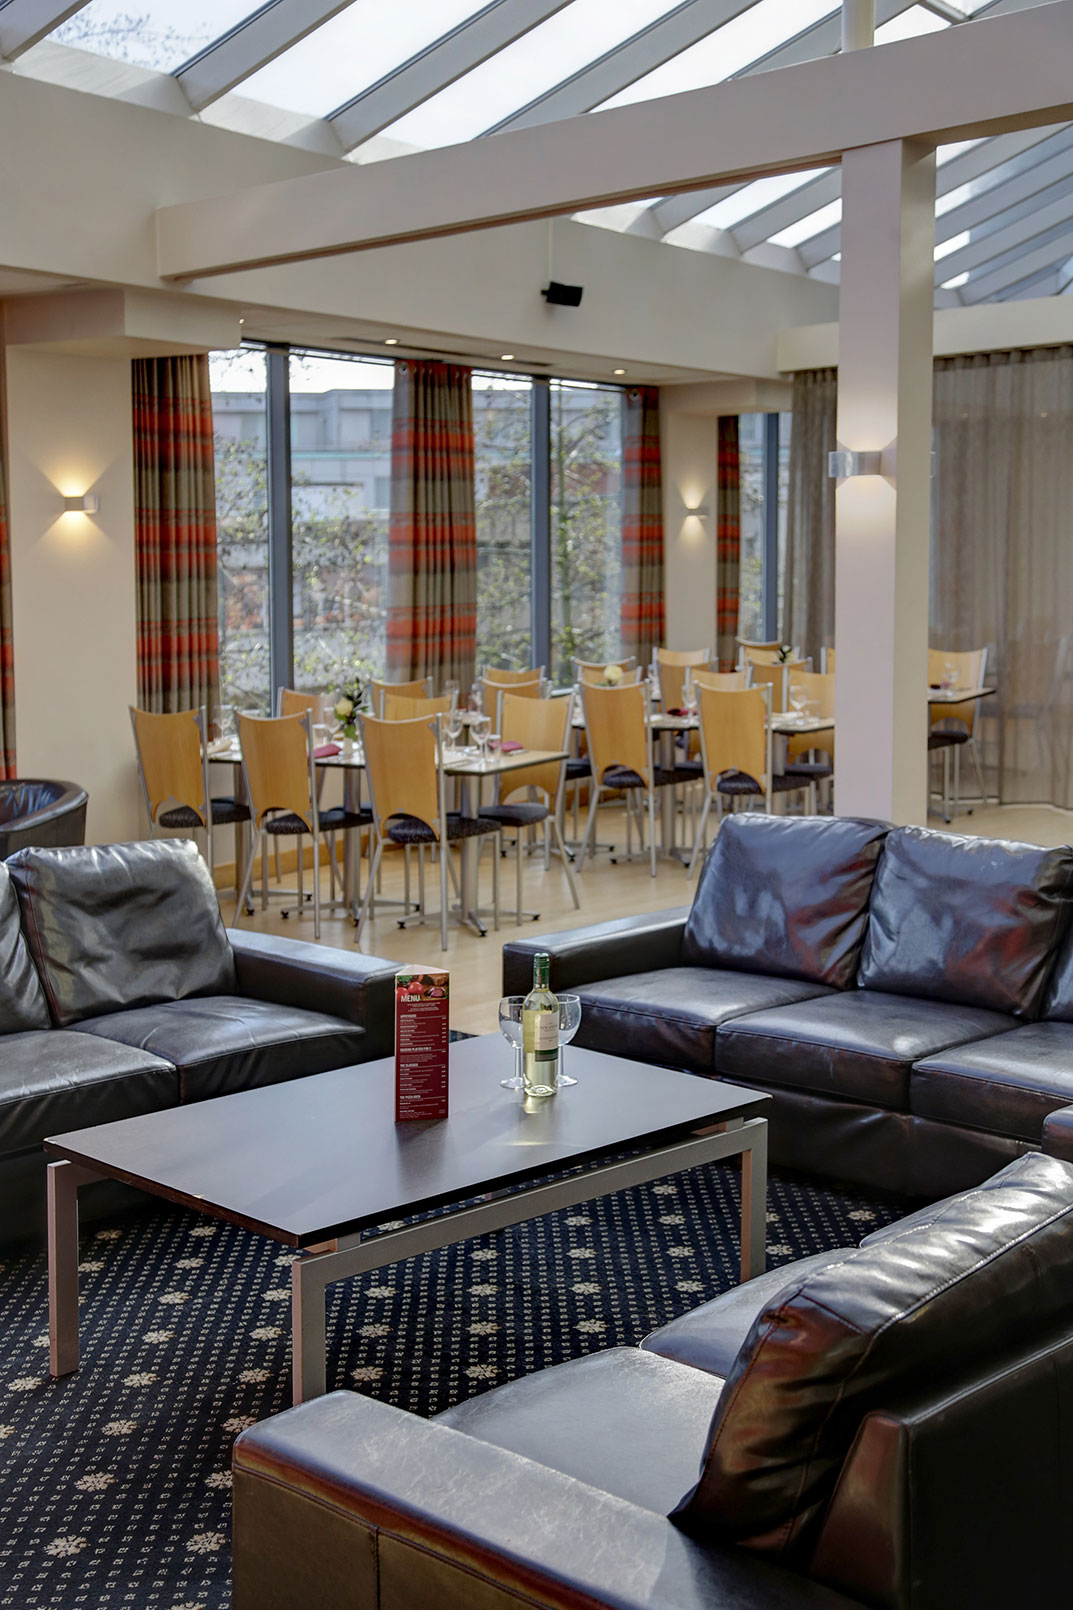 Best Western Hotel Room: Best Western Plus Nottingham City Centre